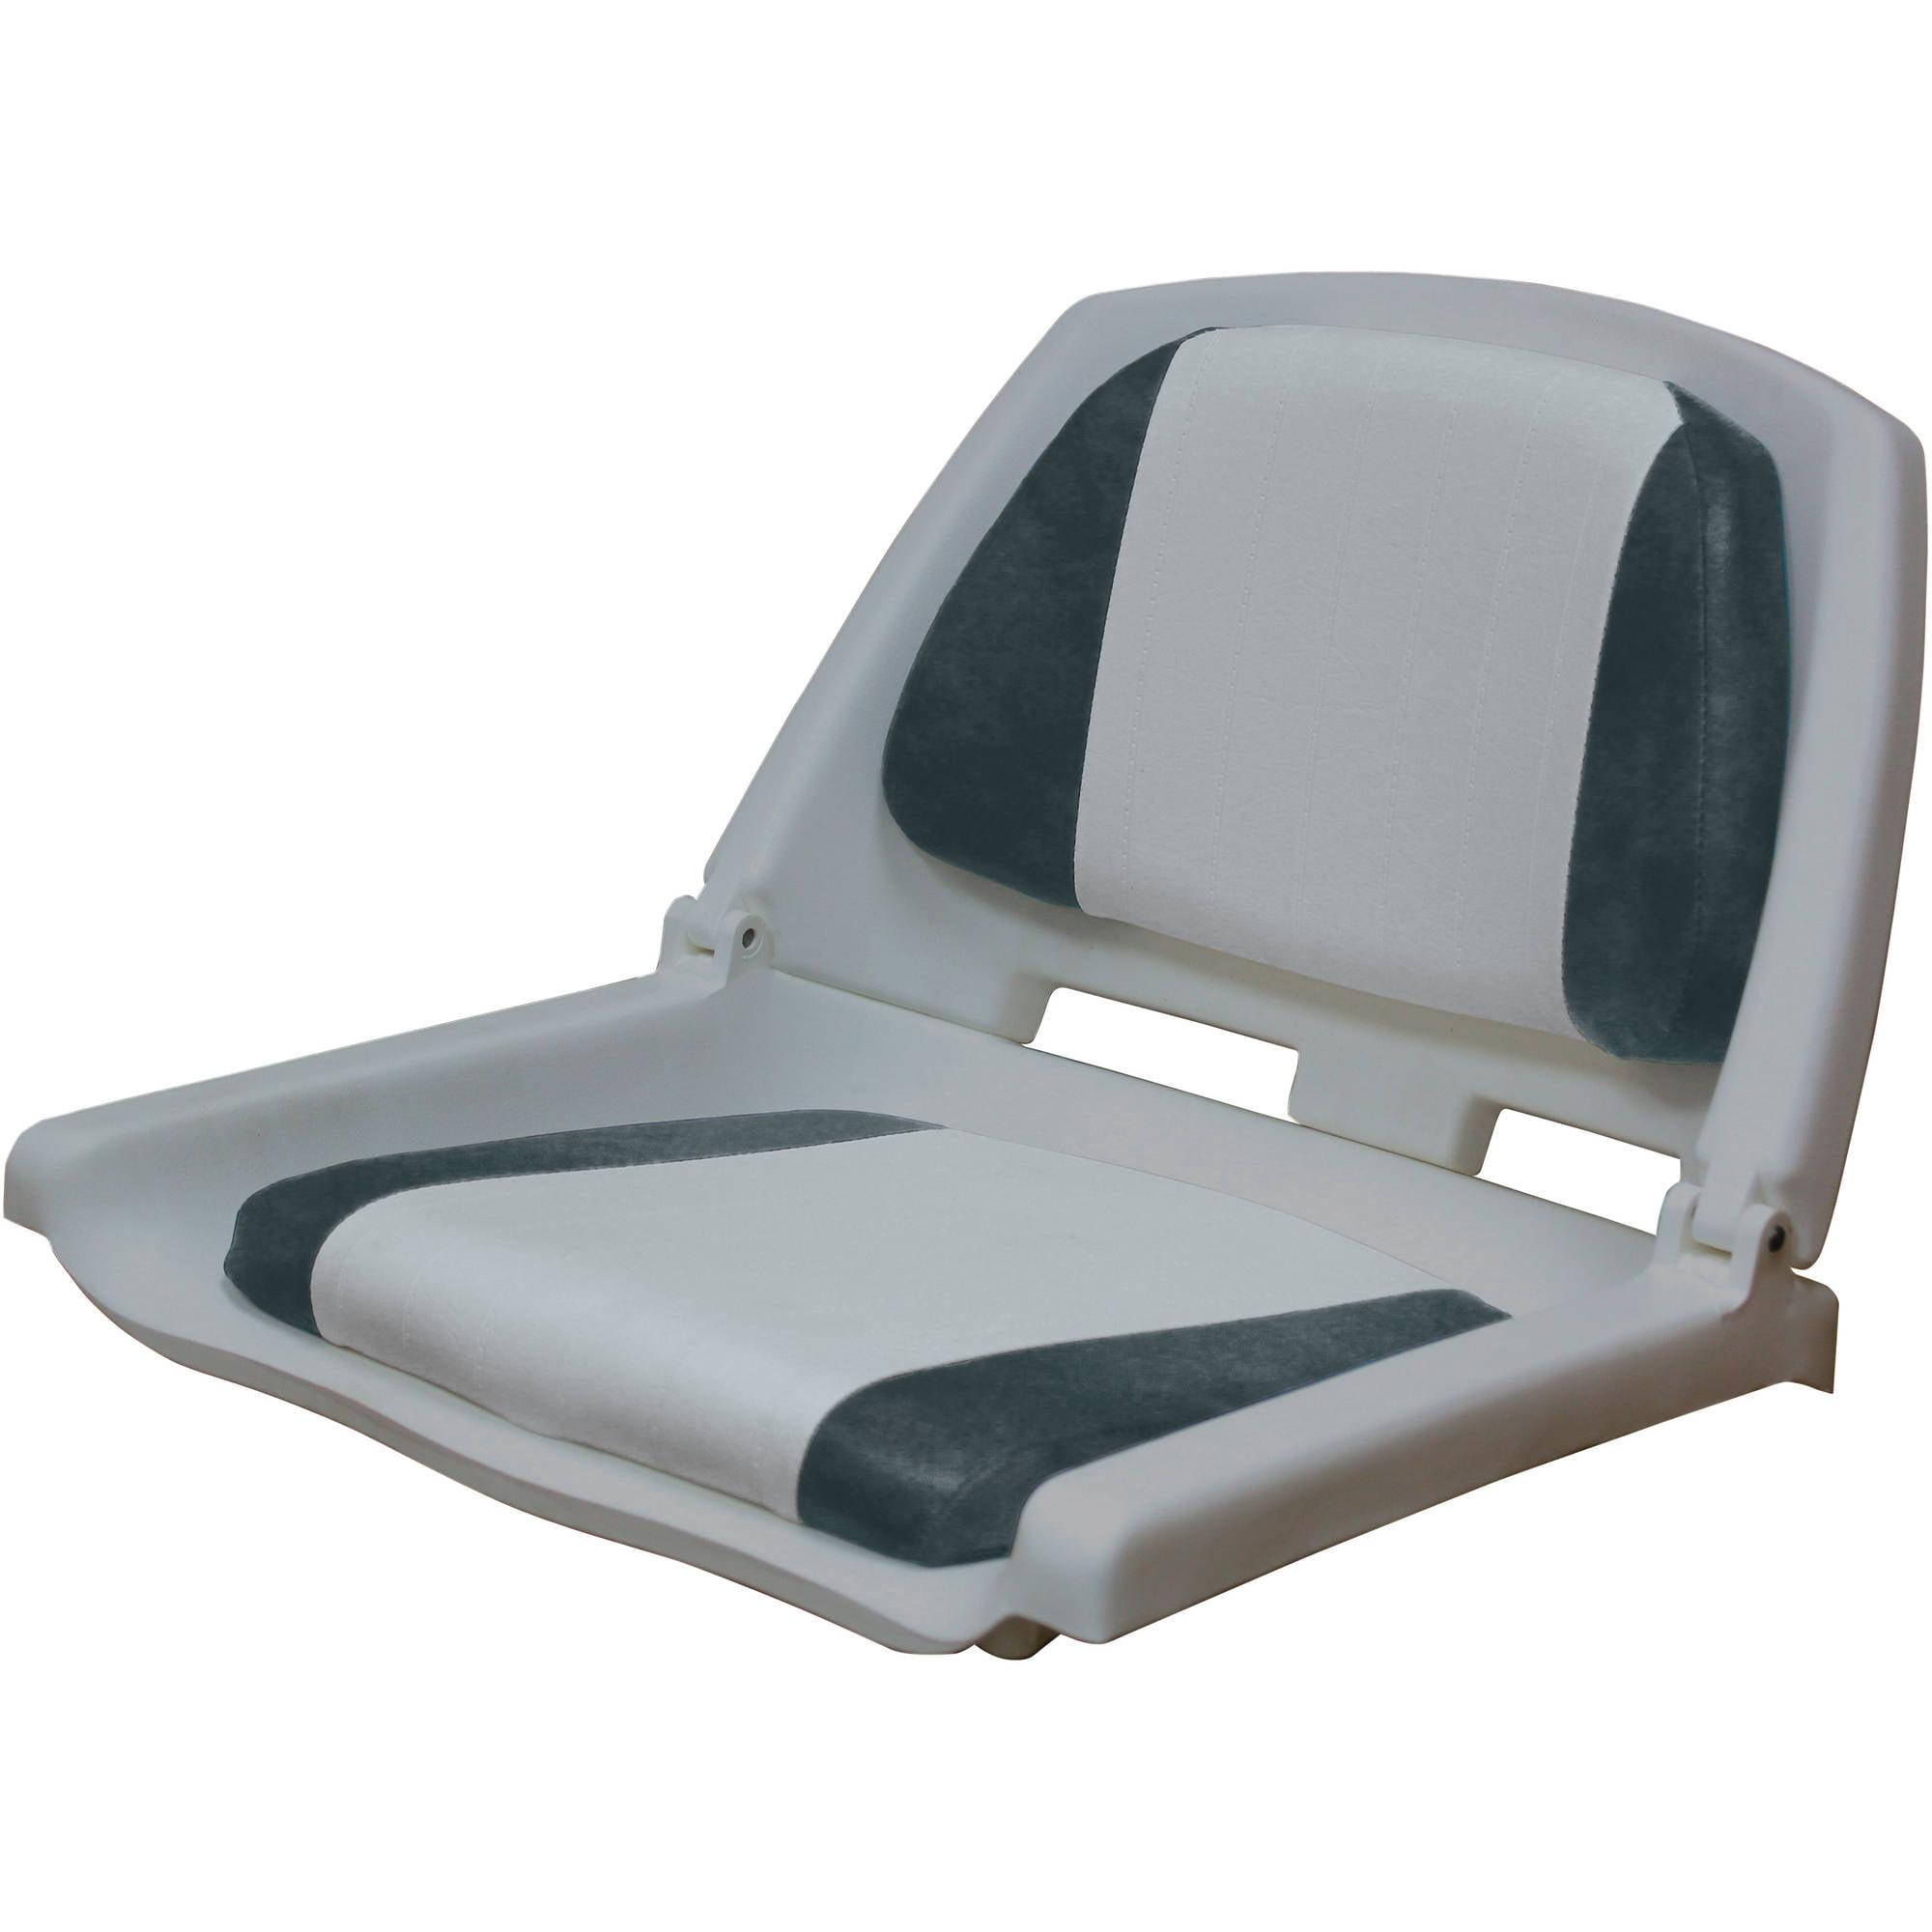 Millennium Boat Seat B-100 Gray